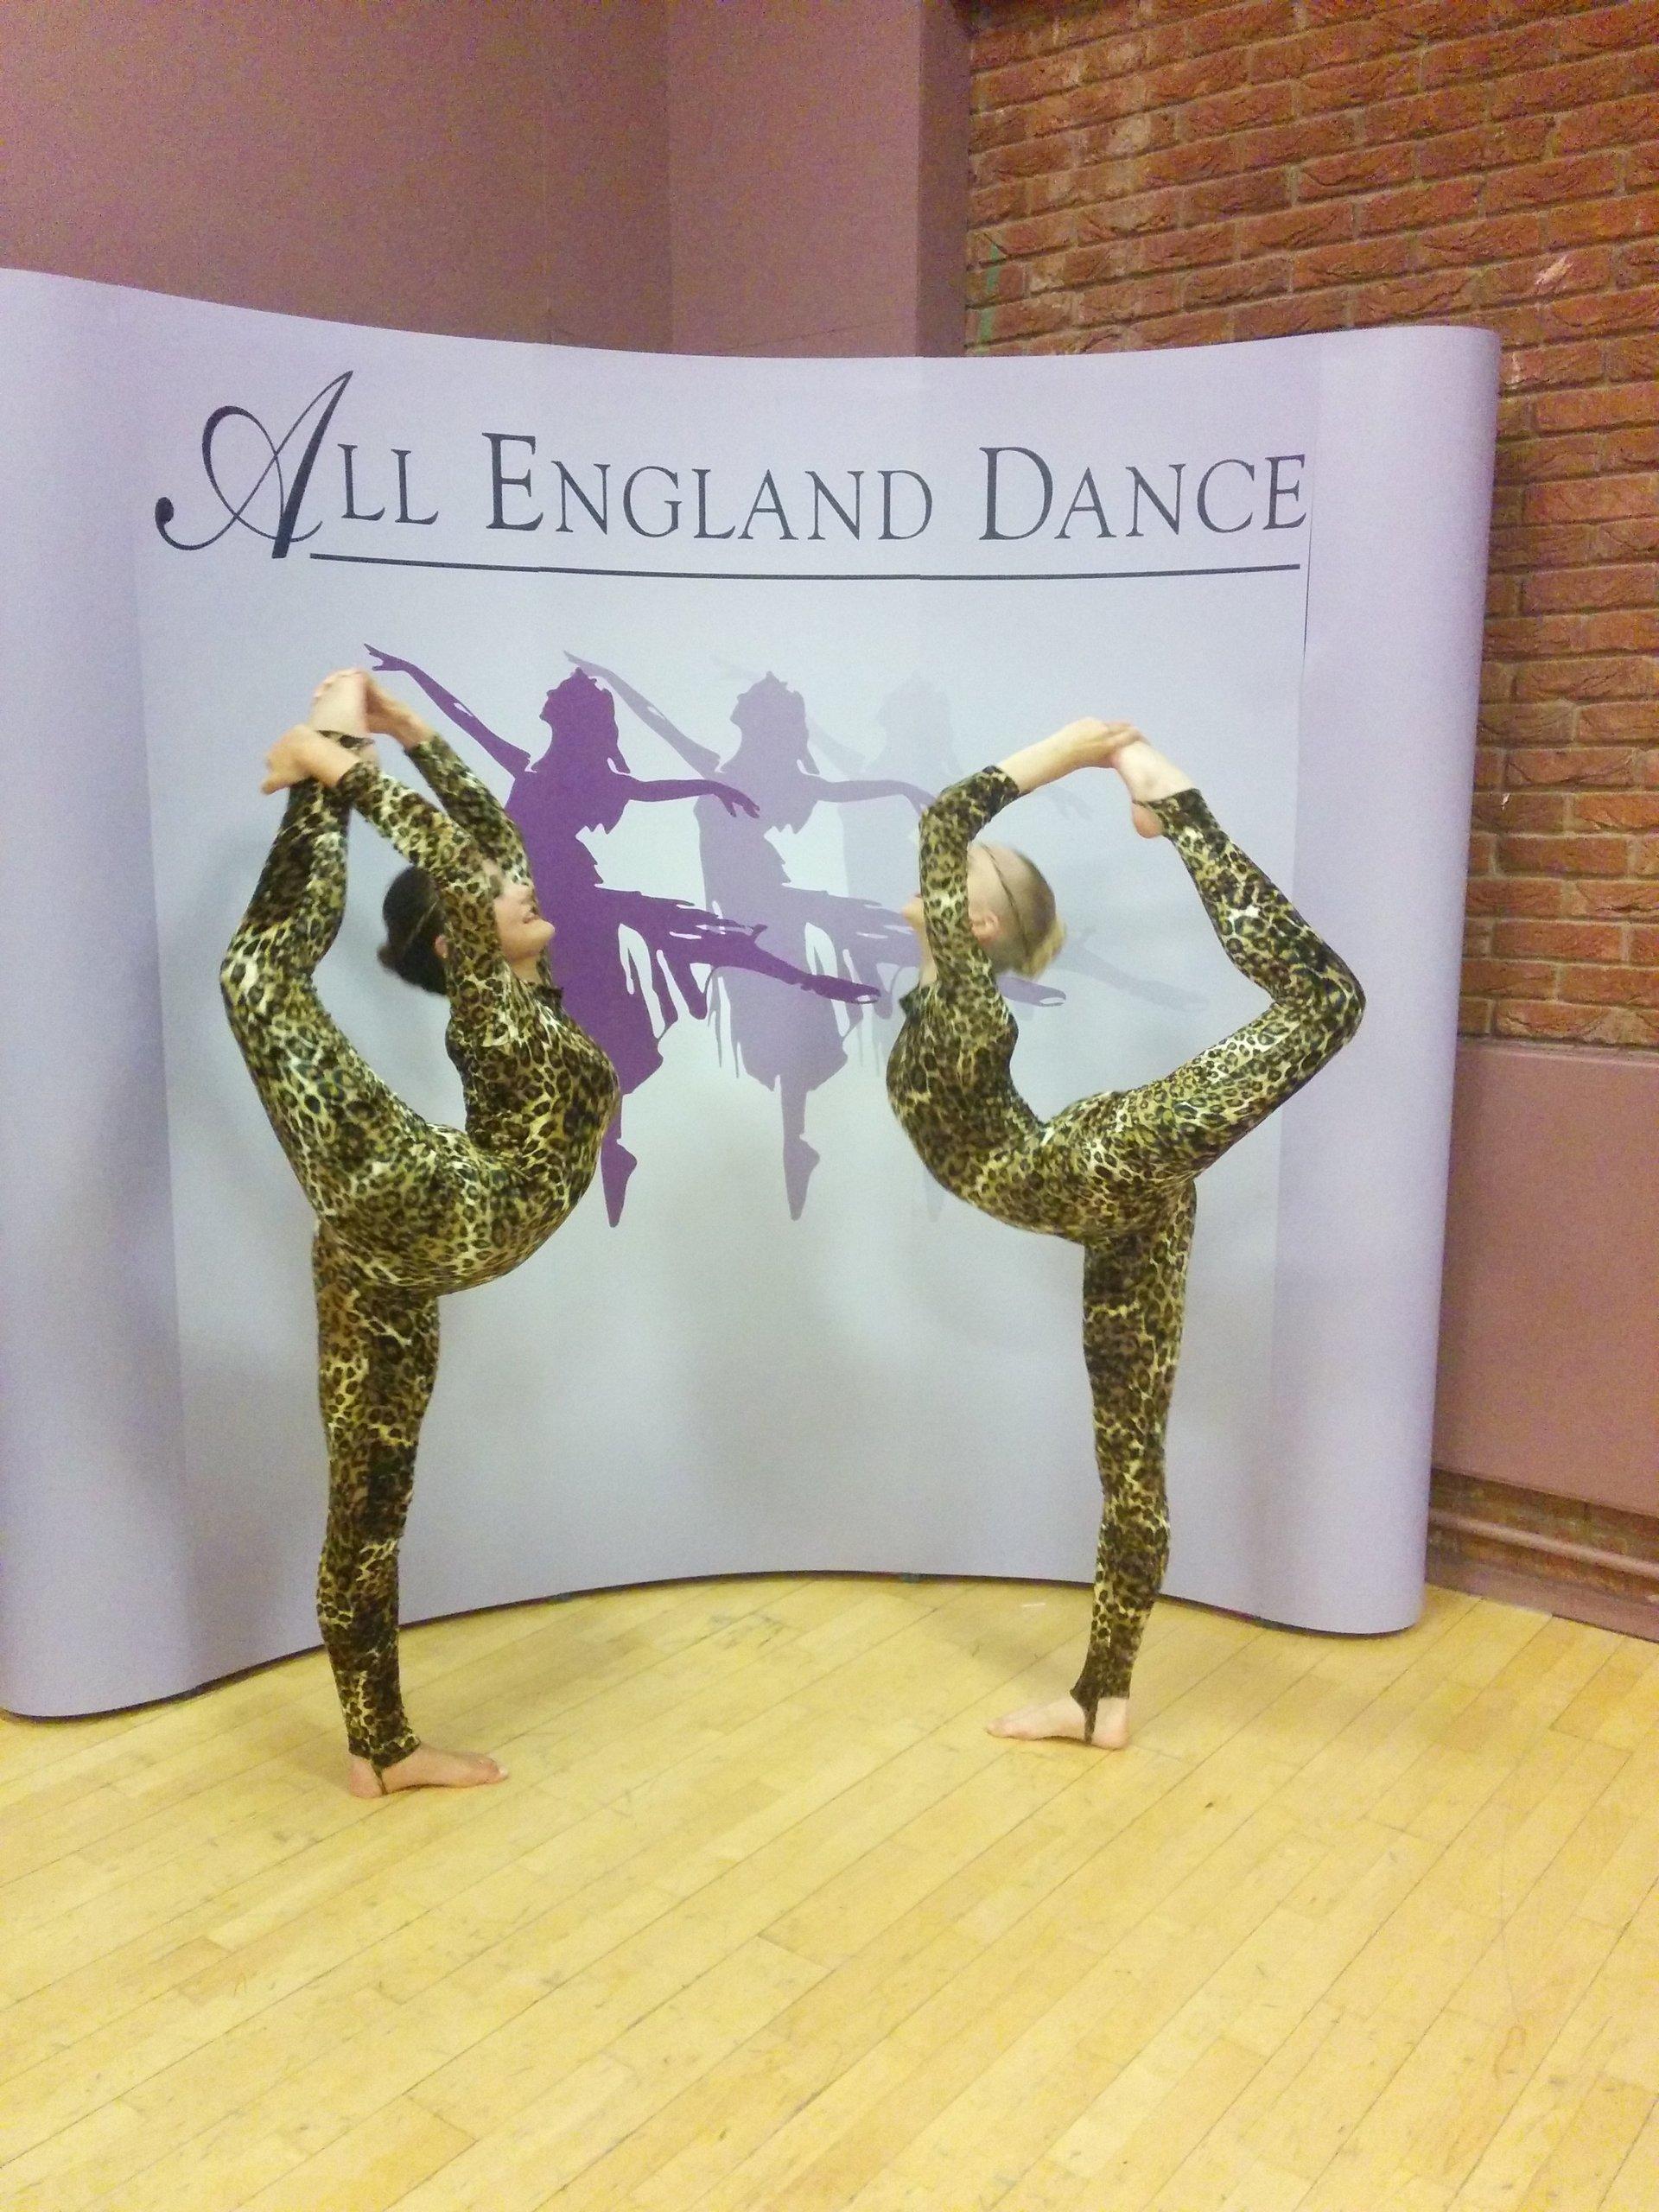 All England Dance